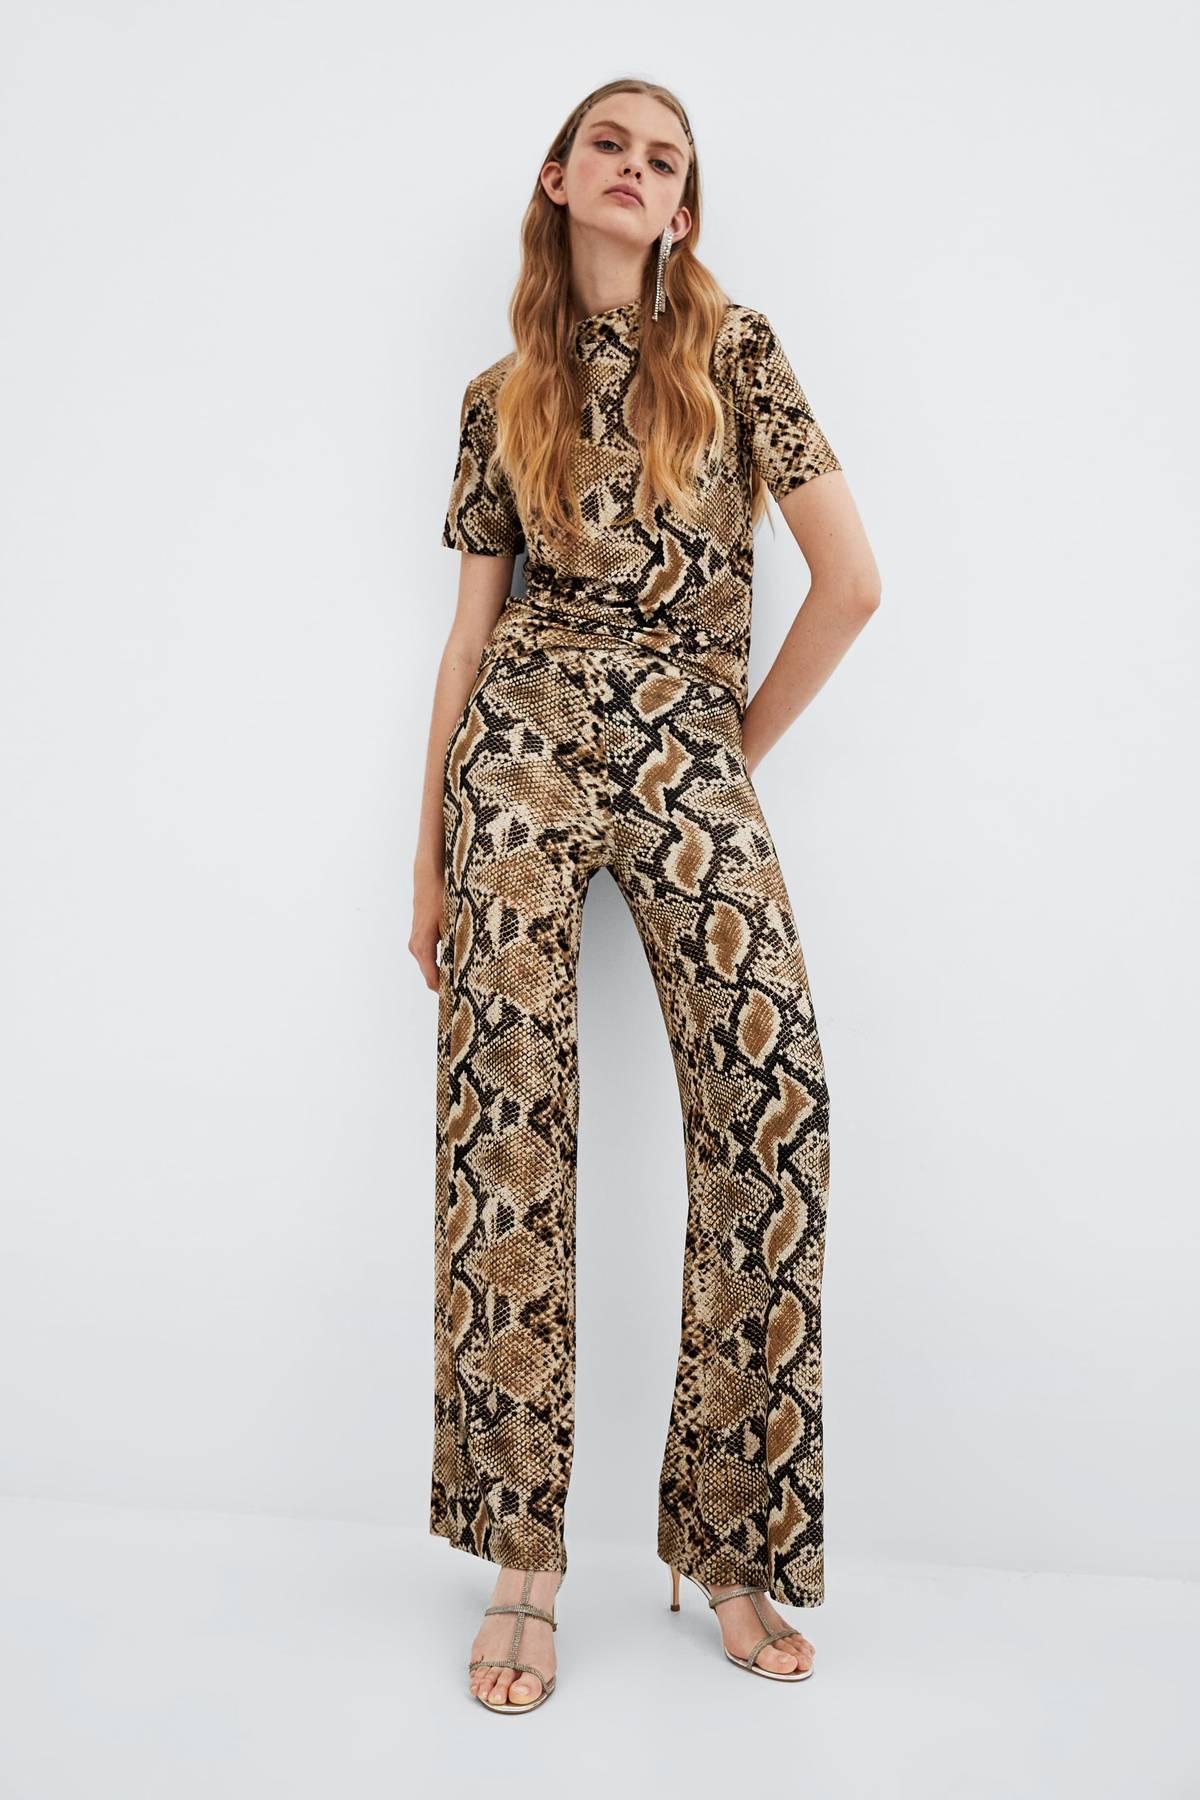 zara-snake-print-trend-274115-1543856183138-product.1200x0c